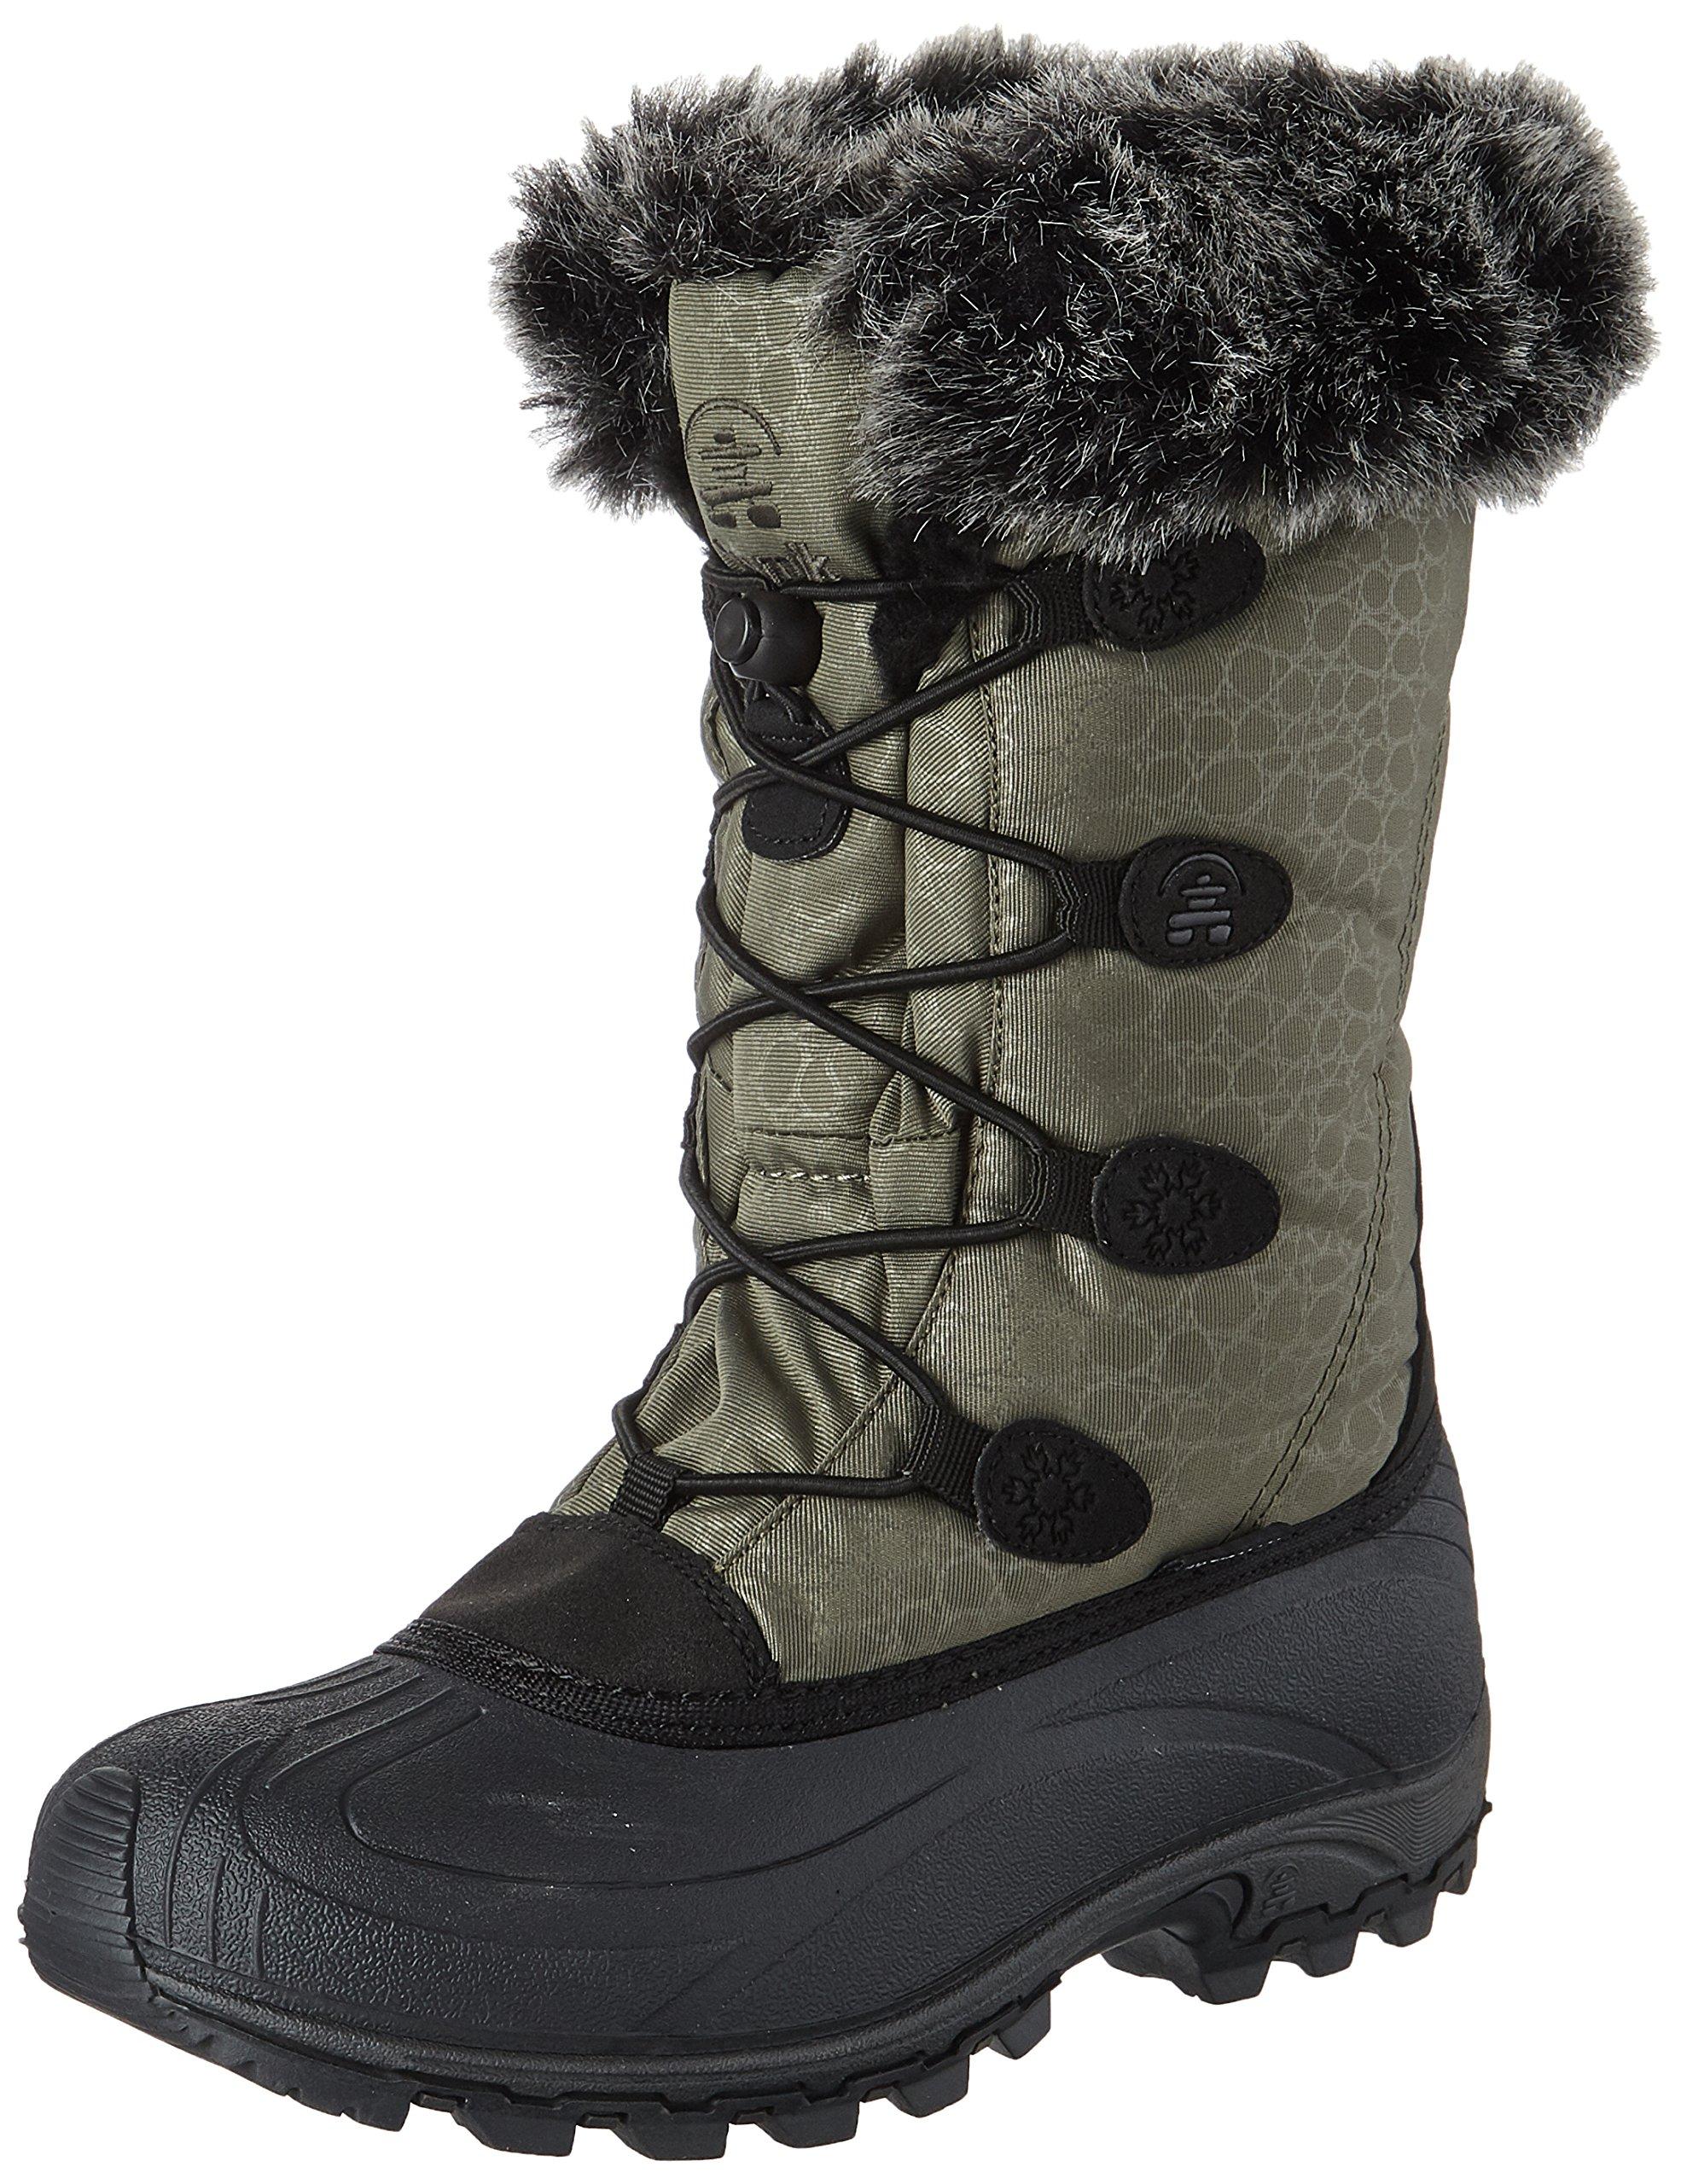 Kamik Women's Momentum Snow Boot, Khaki, 10 M US